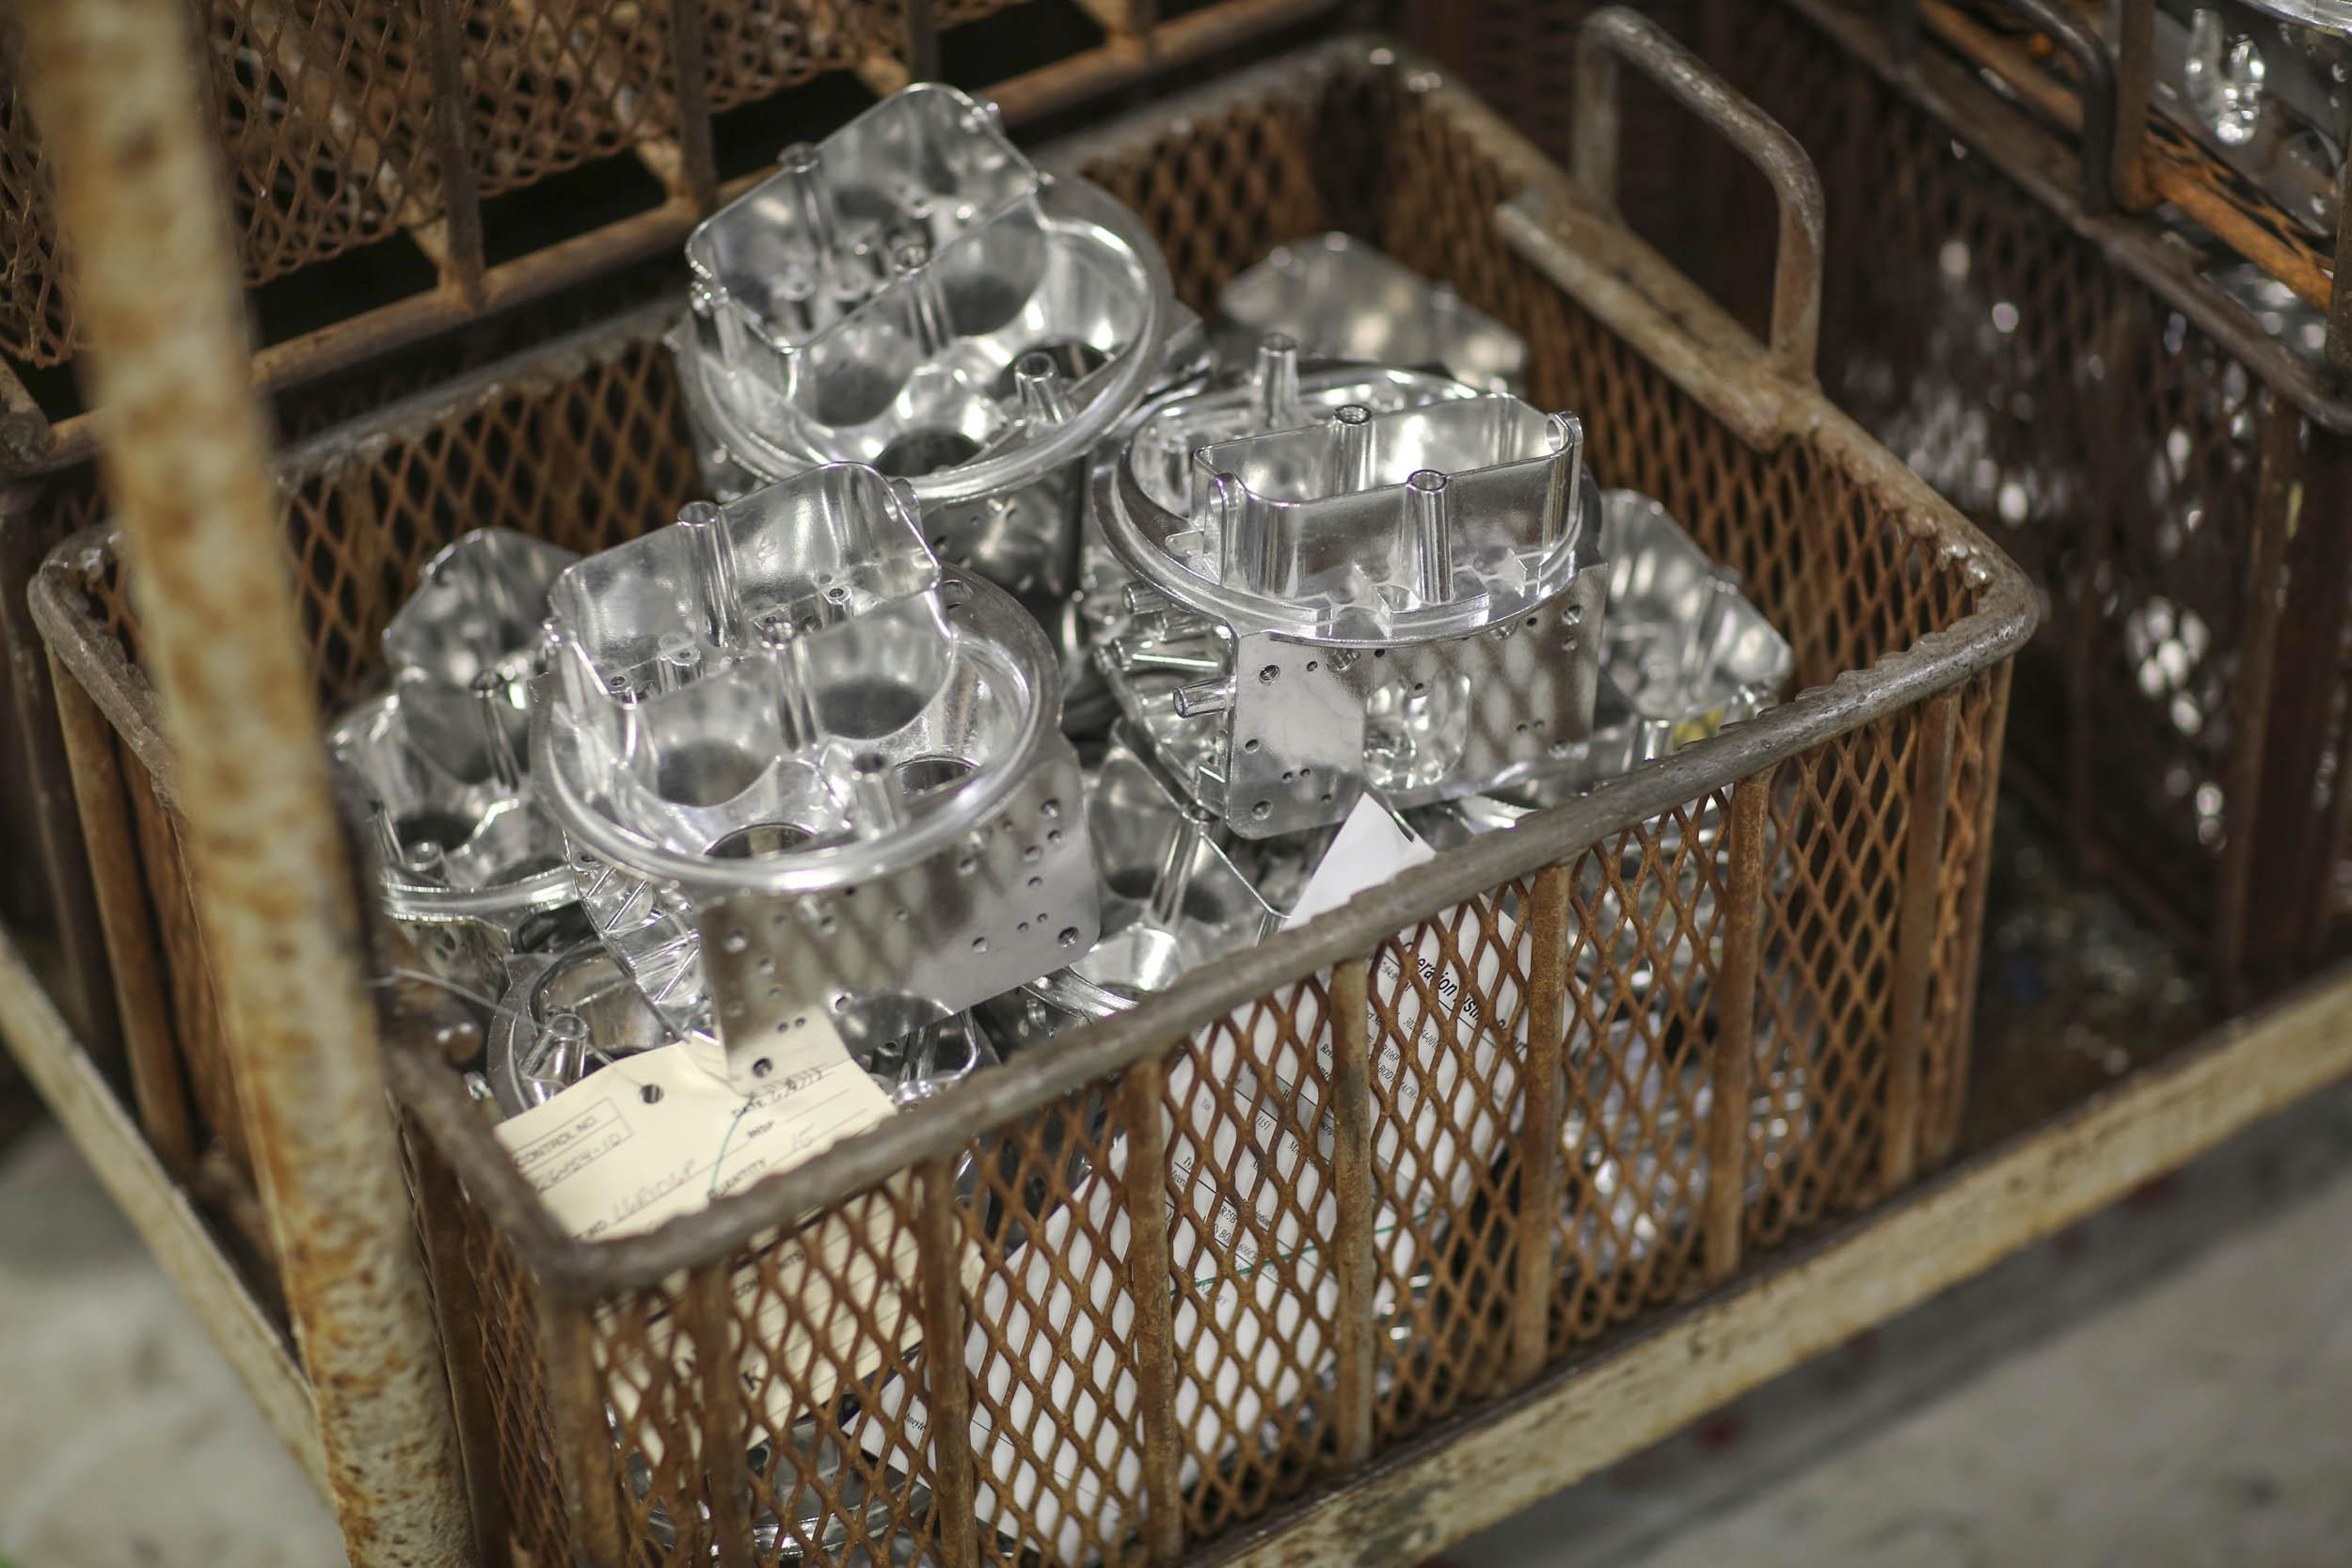 Holley carburetor machine shop